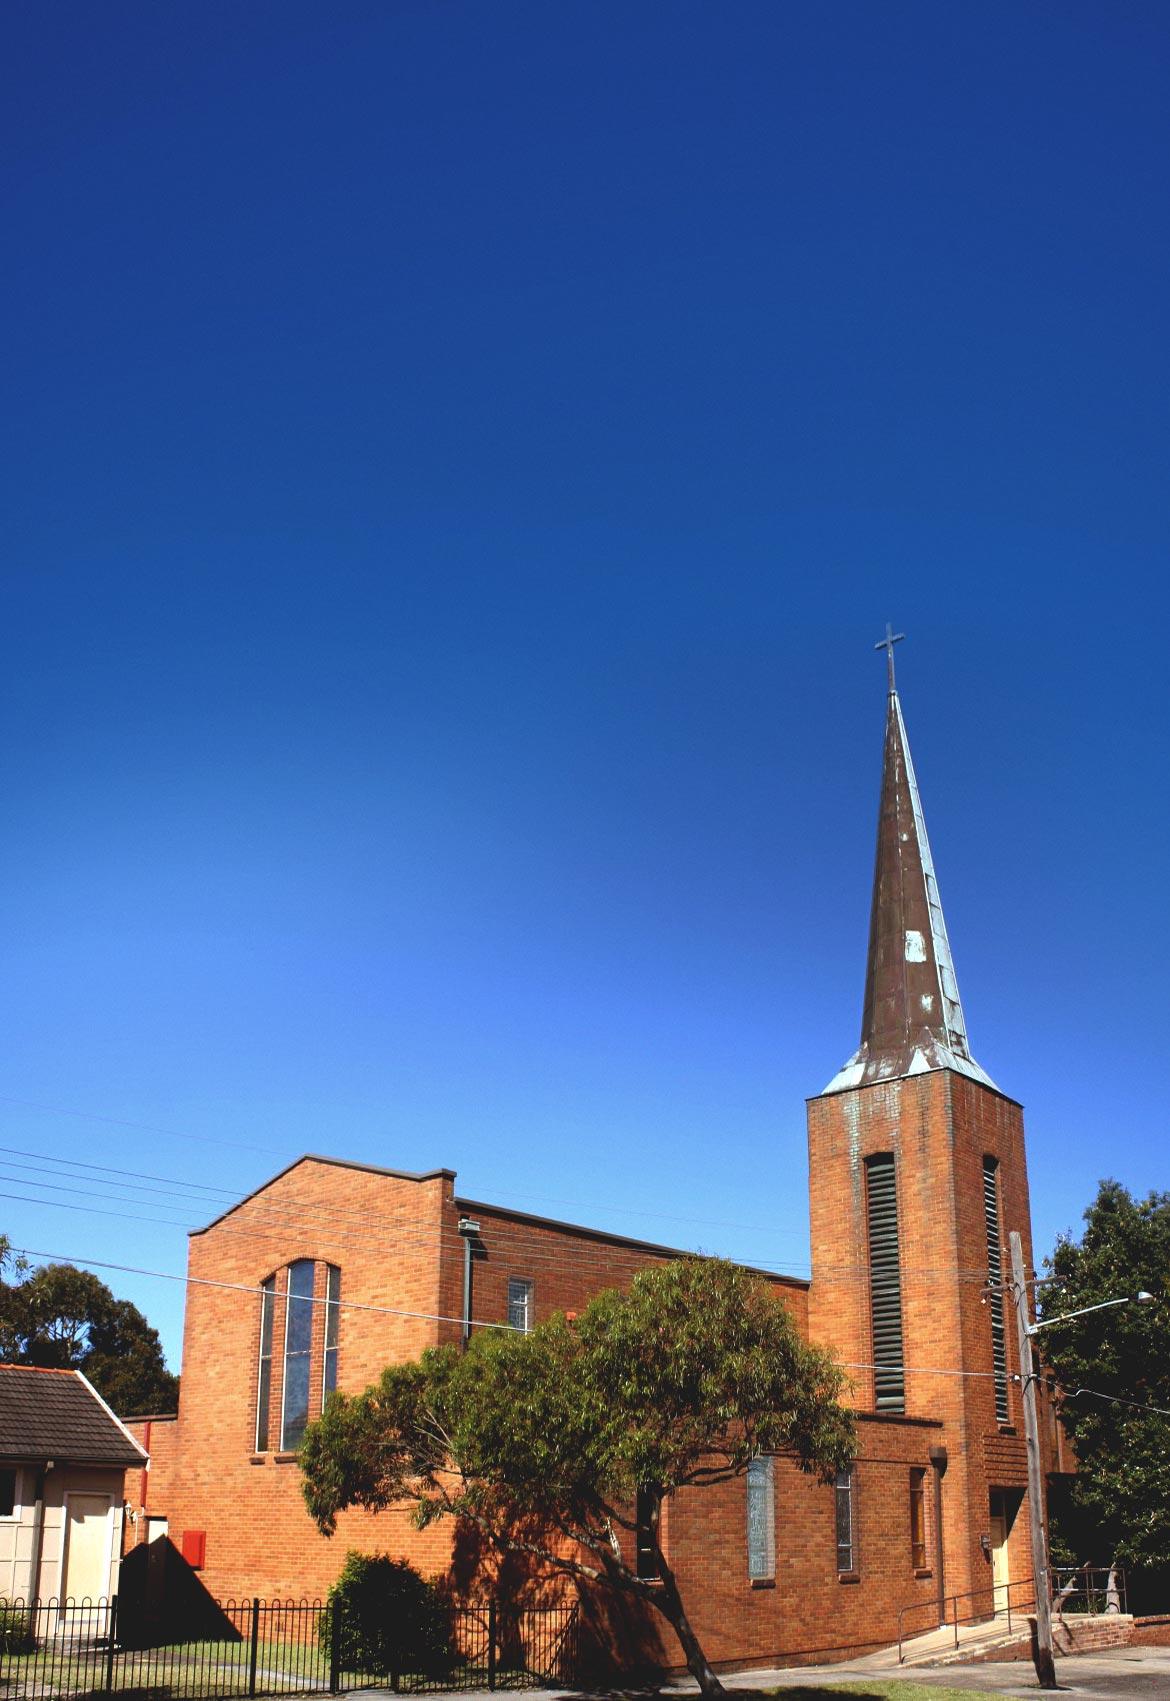 Maroubra-Wild-St-Anglican-Church.jpg